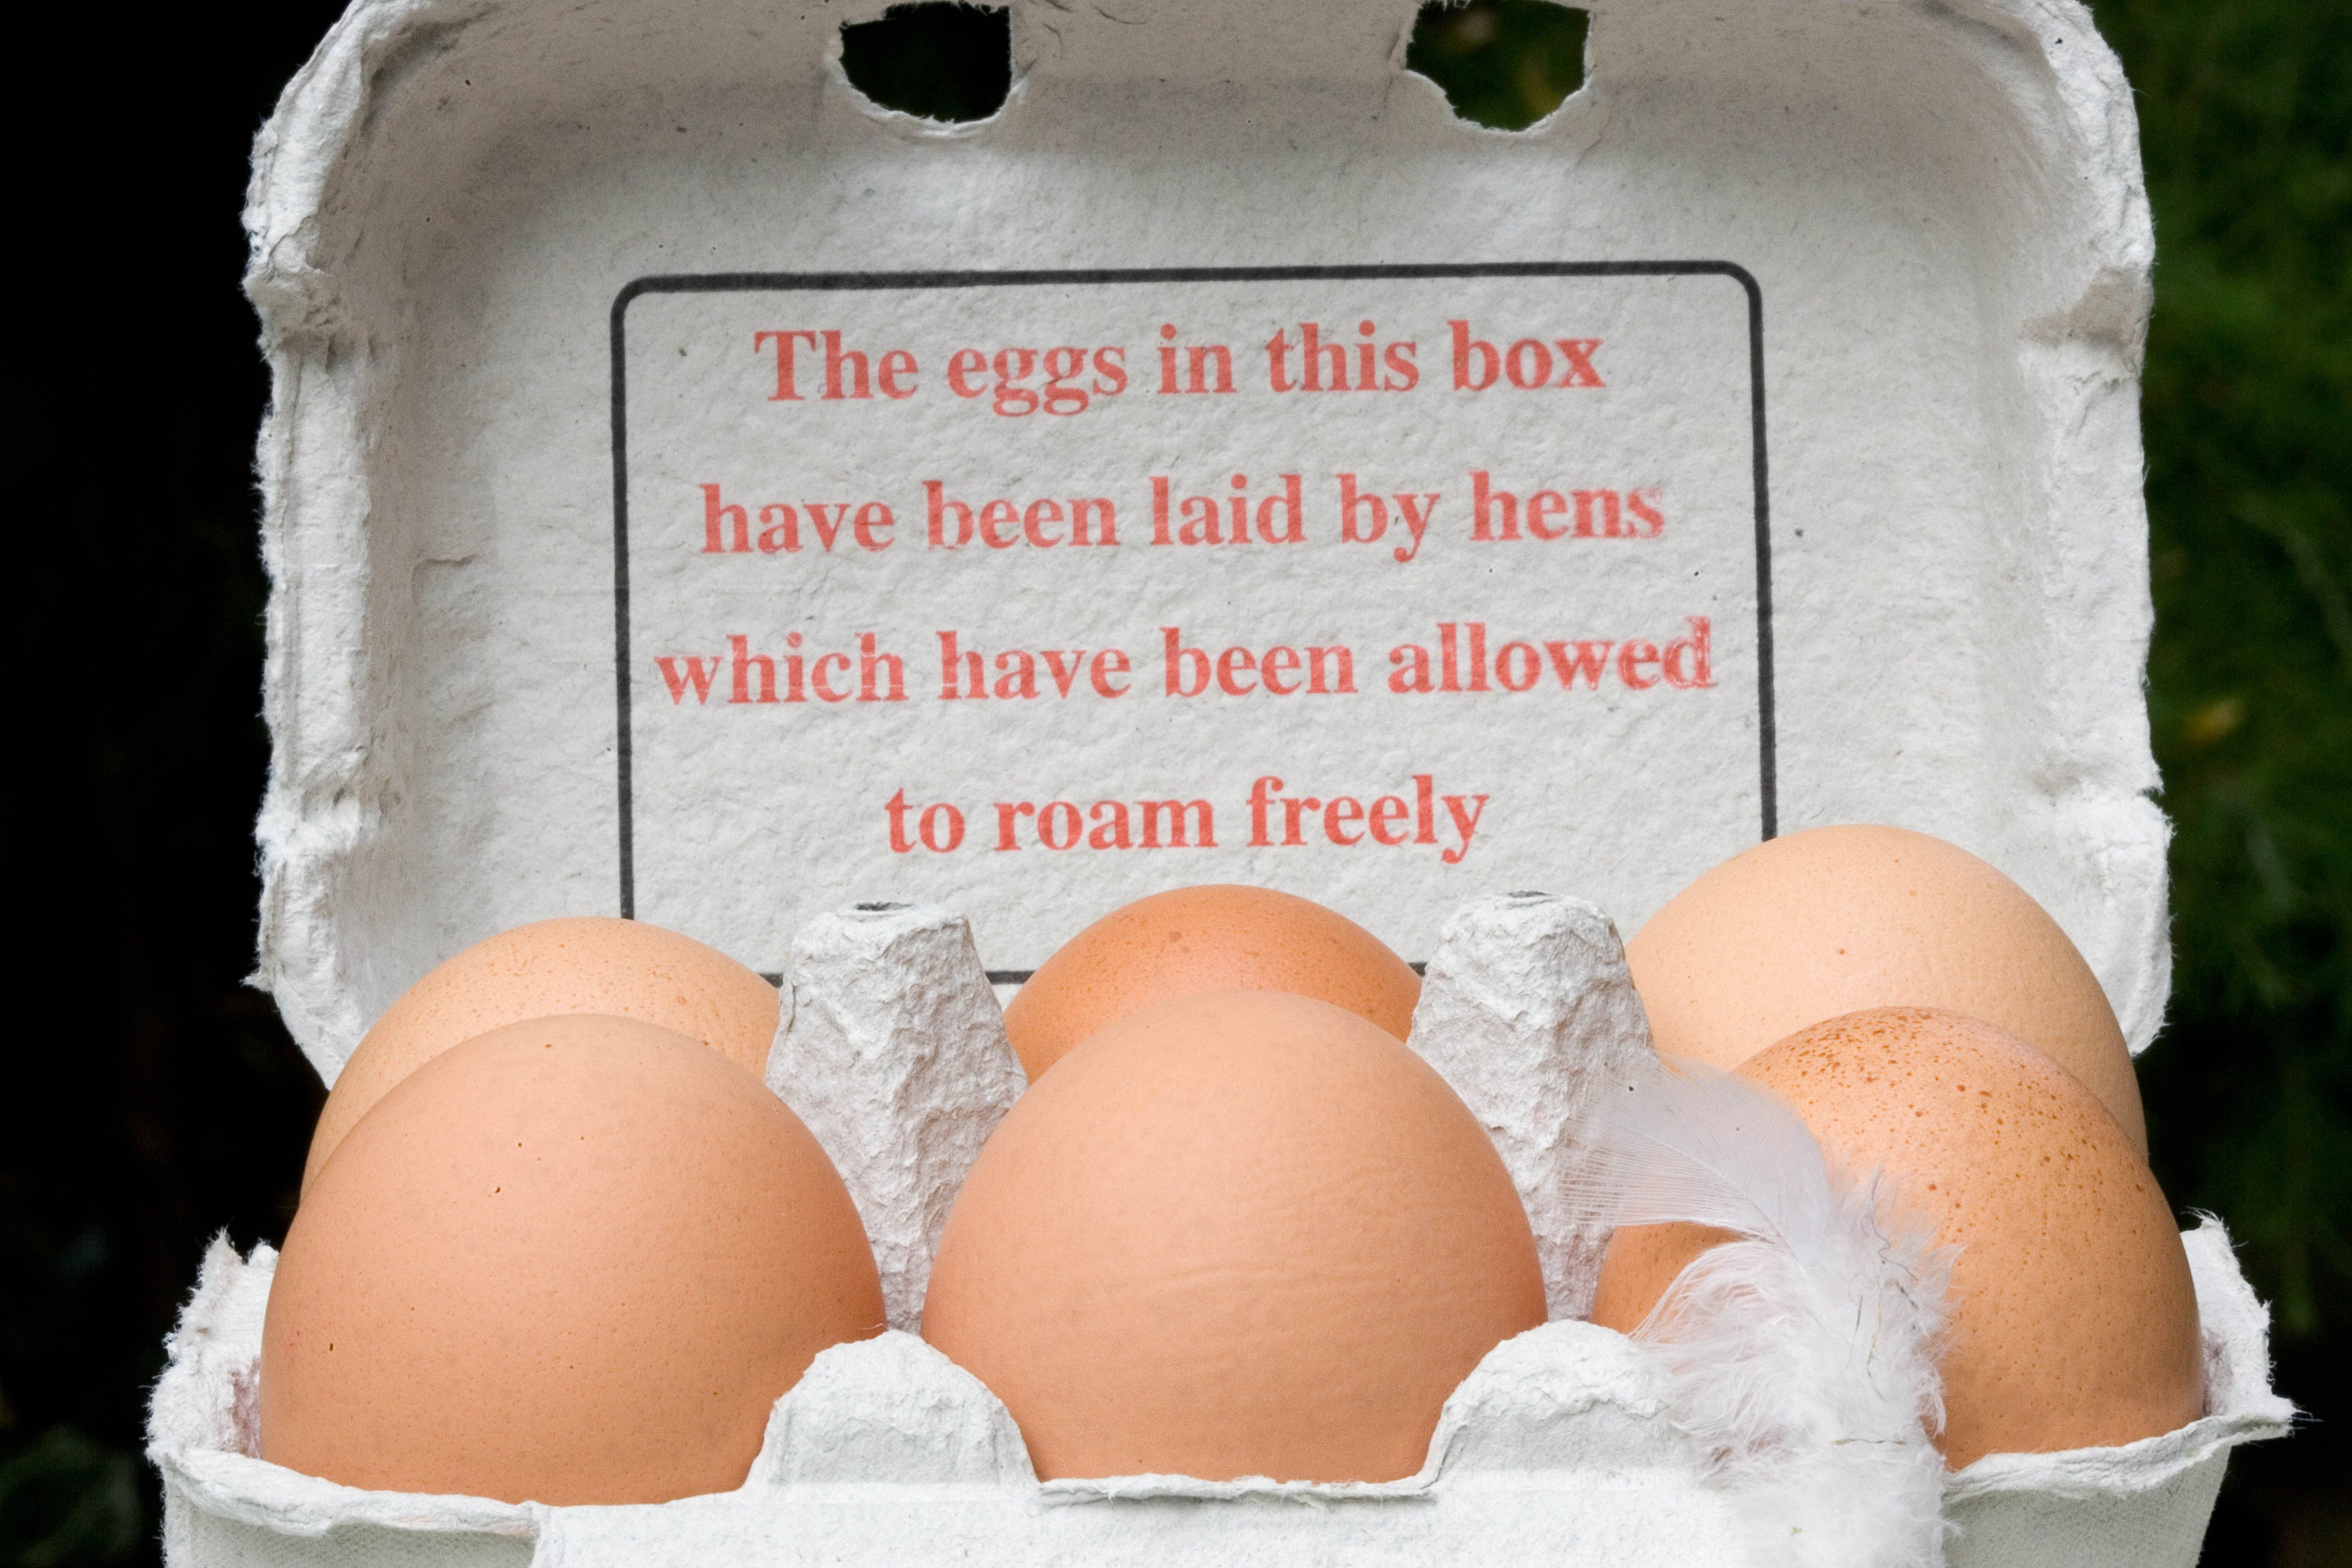 Free-range eggs in carton